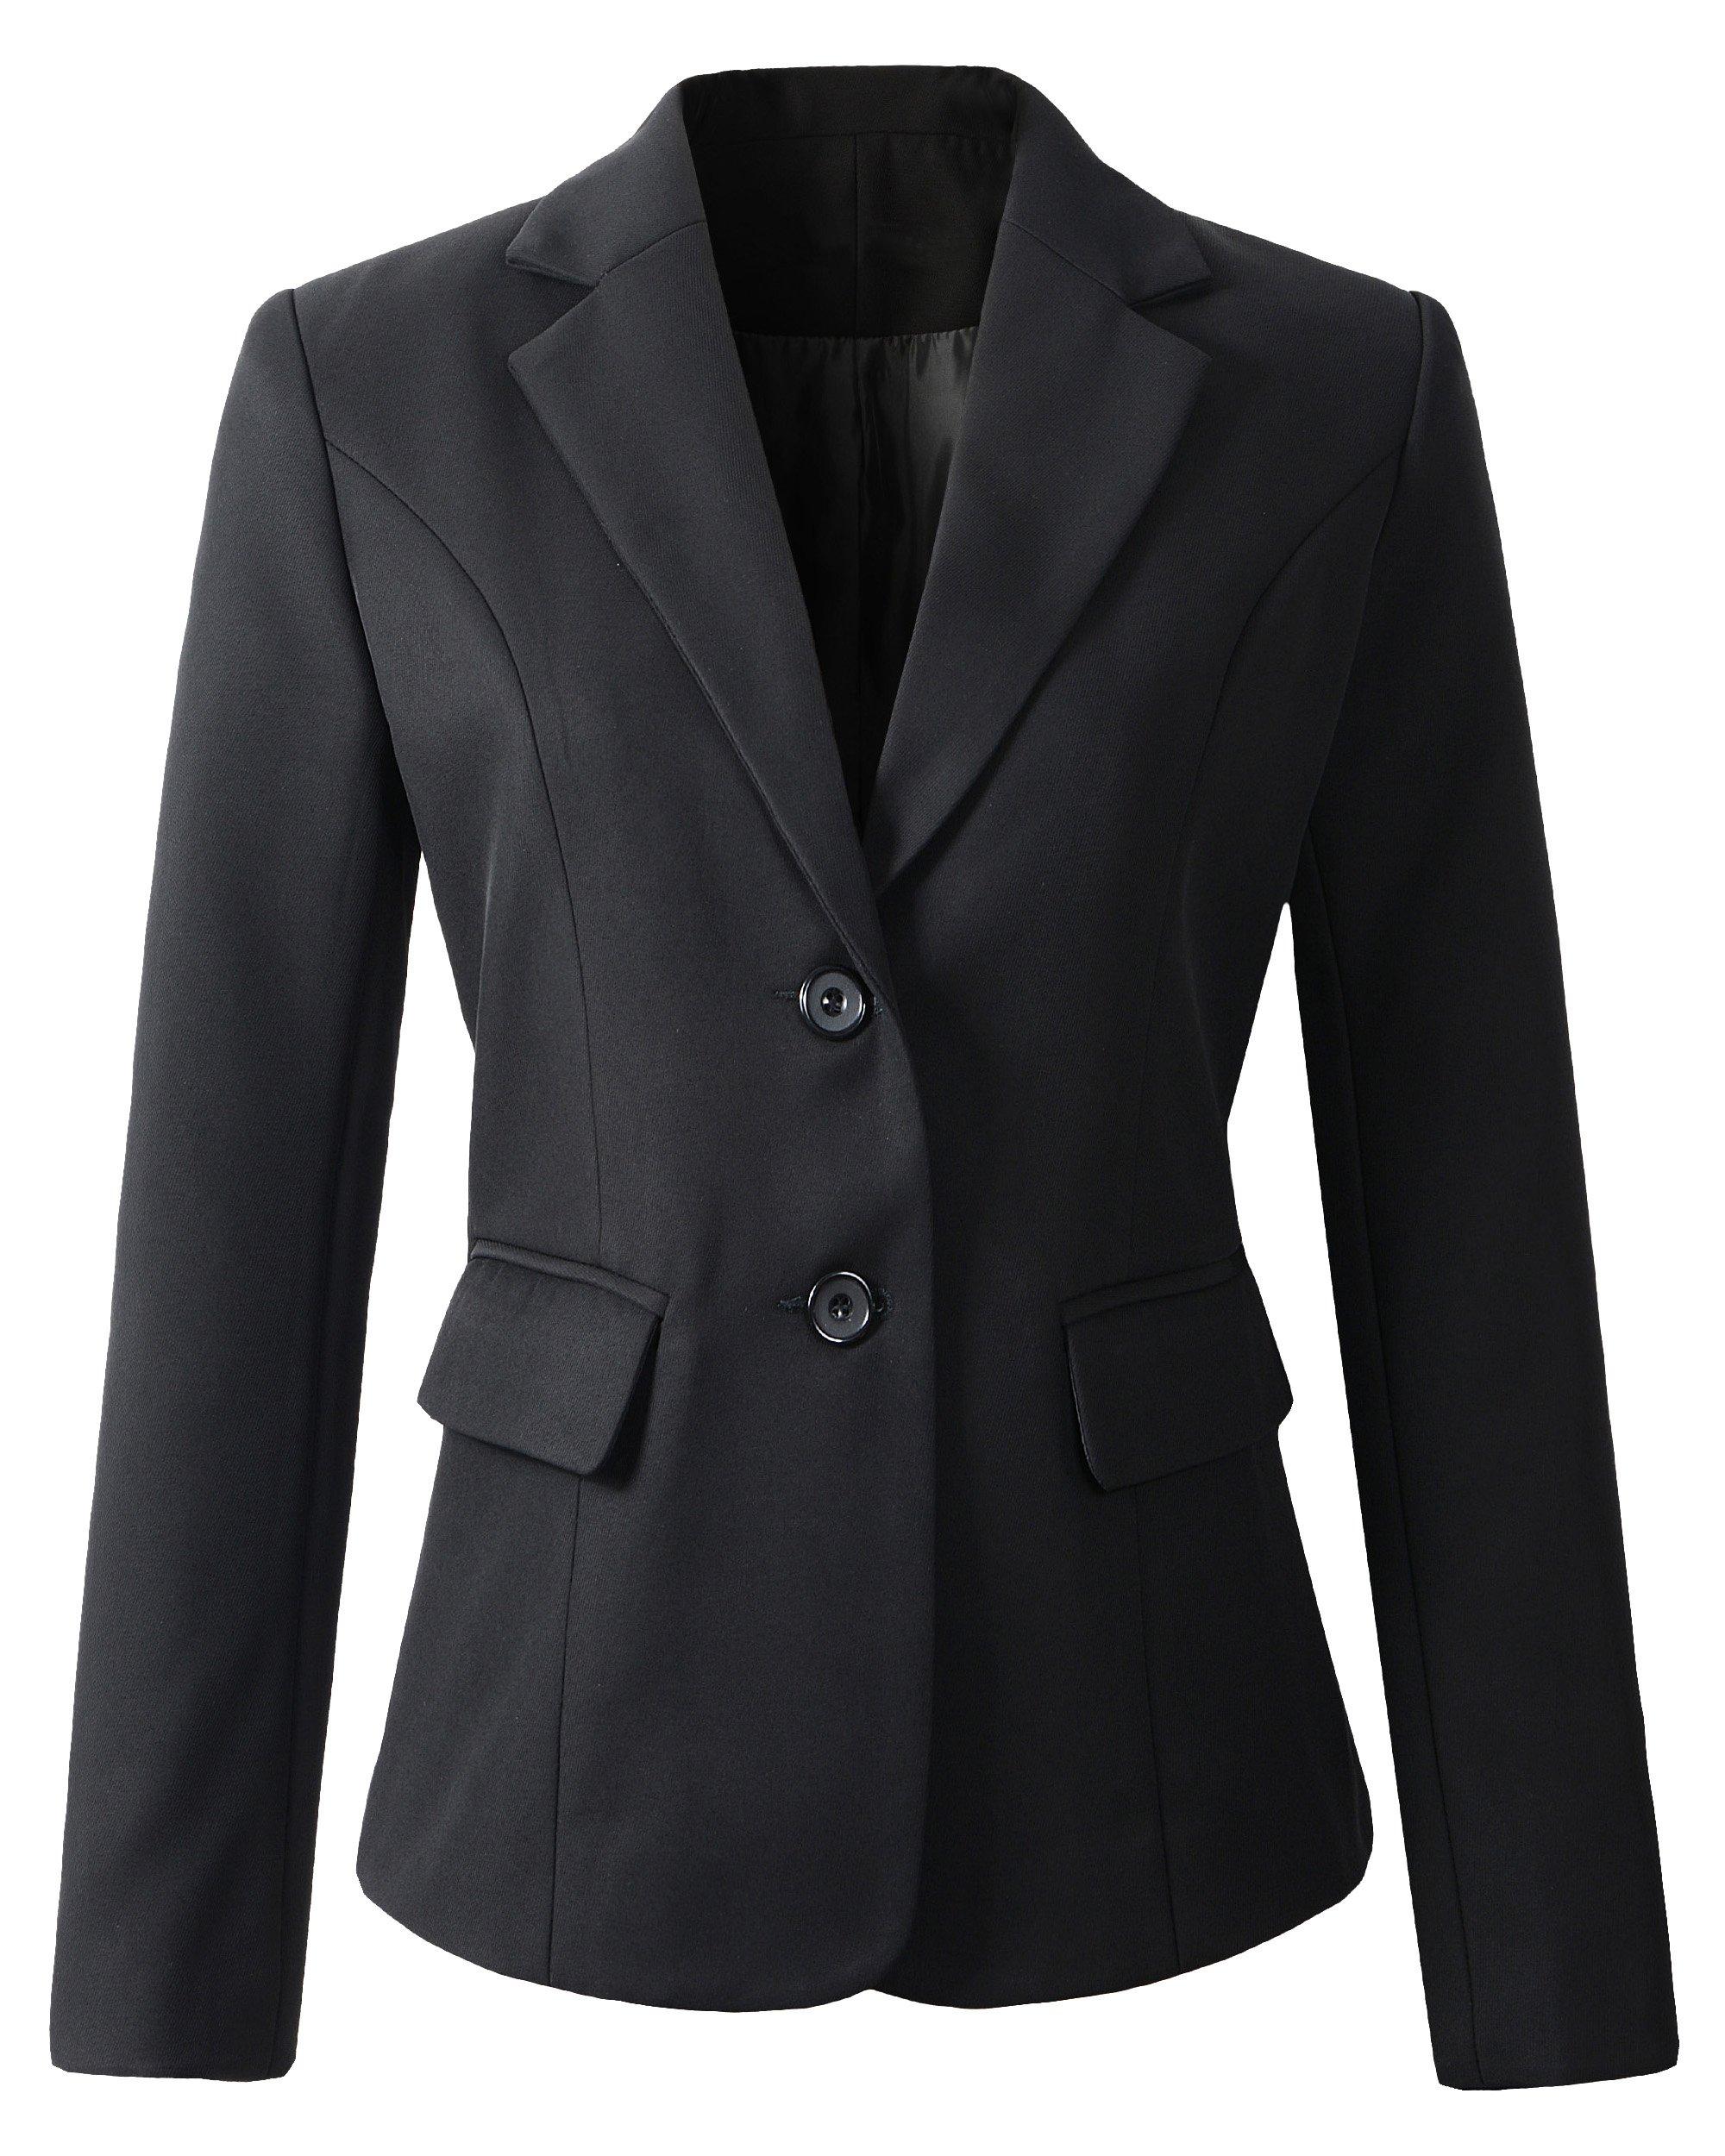 Benibos Womens Formal 2 Button Blazer Jacket (L, 918Black)